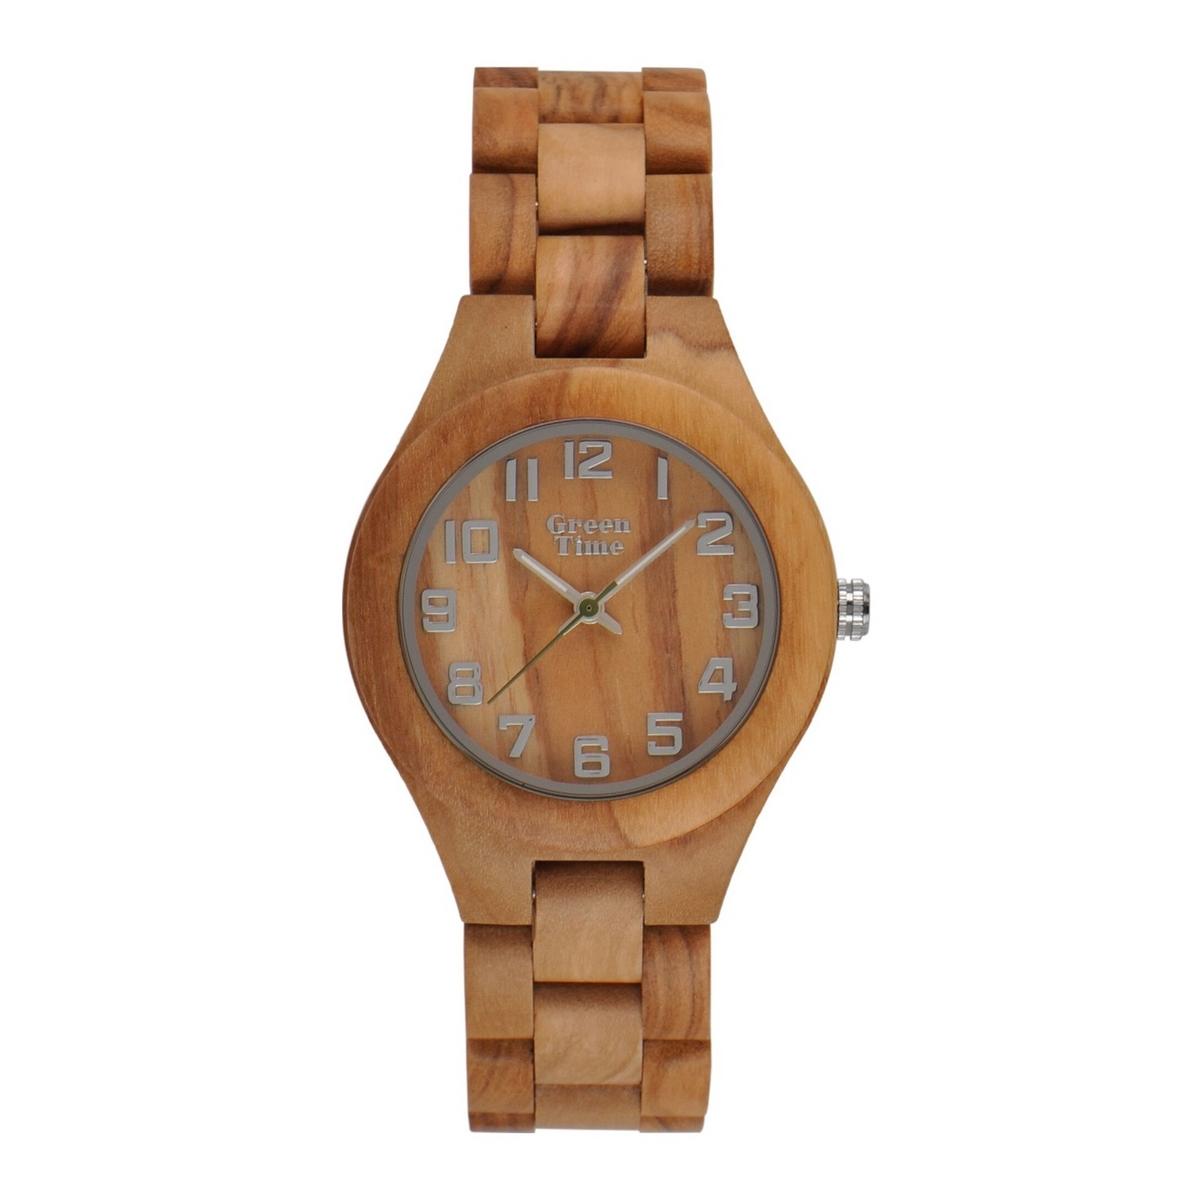 GreenTime ZW059A Horloge 36mm